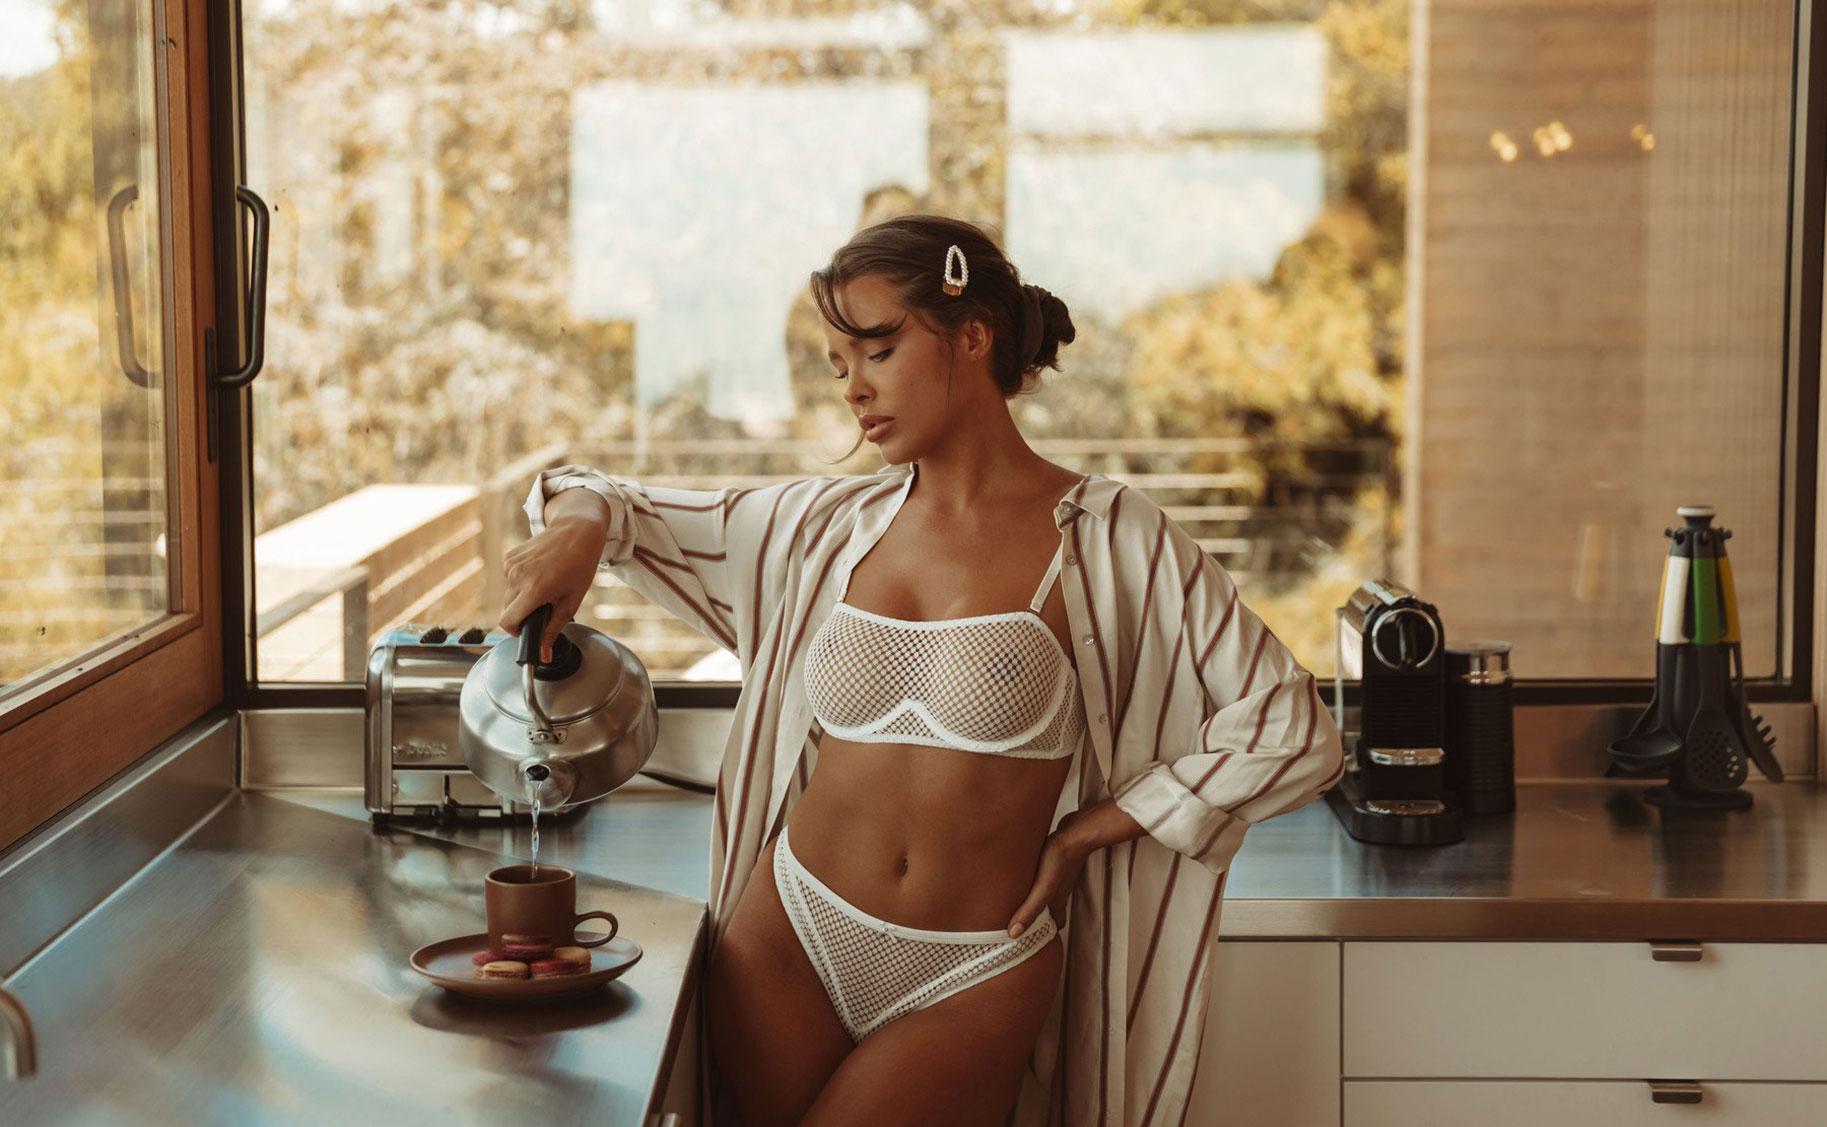 Мара Тиген в нижнем белье и купальниках модного бренда Gooseberry Intimates / фото 01